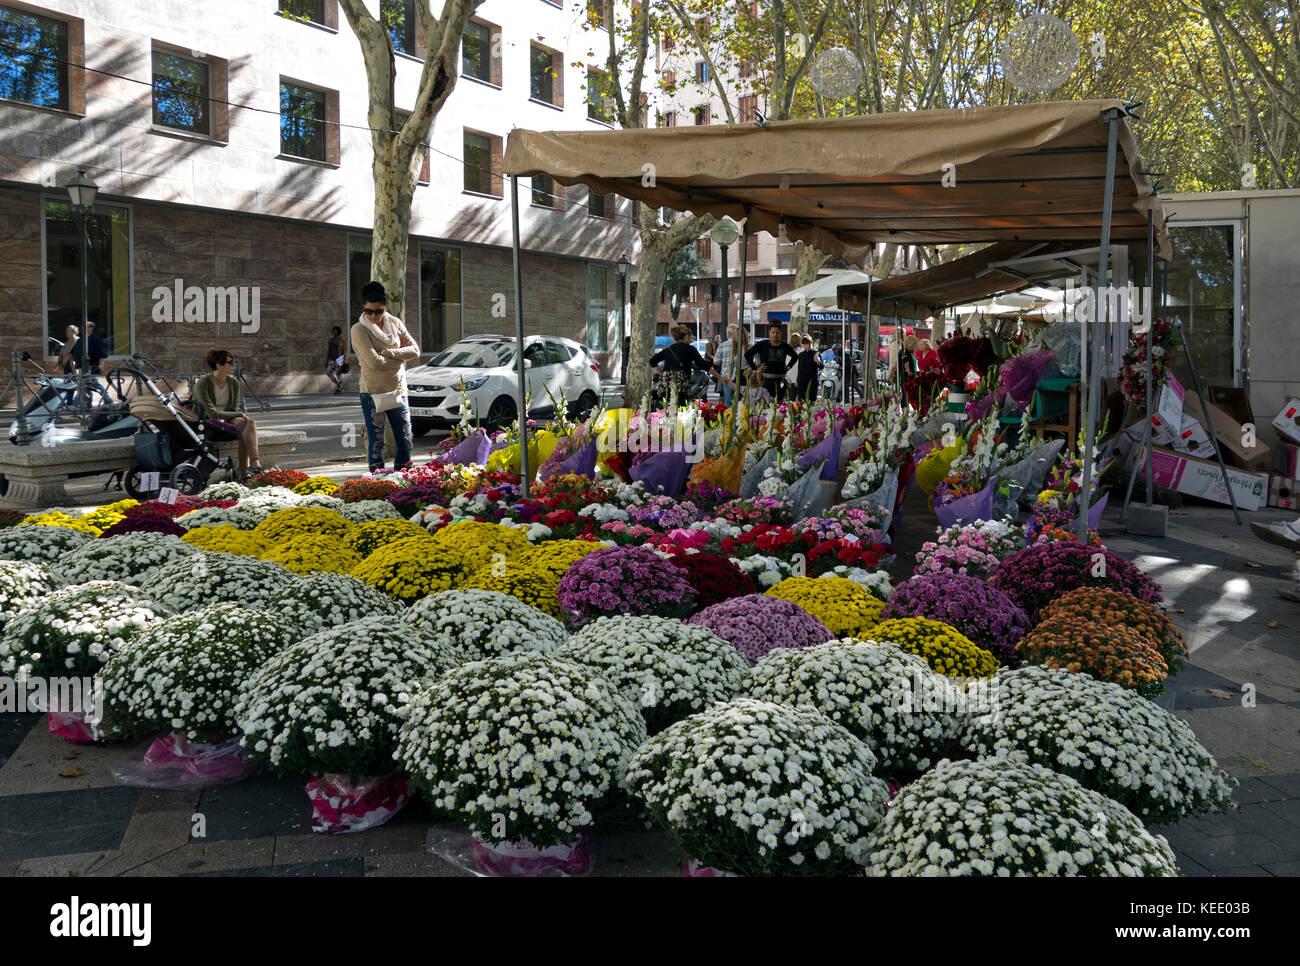 Street flowers shops.La Rambla.Palma de Mallorca.Mallorca Island.Spain - Stock Image